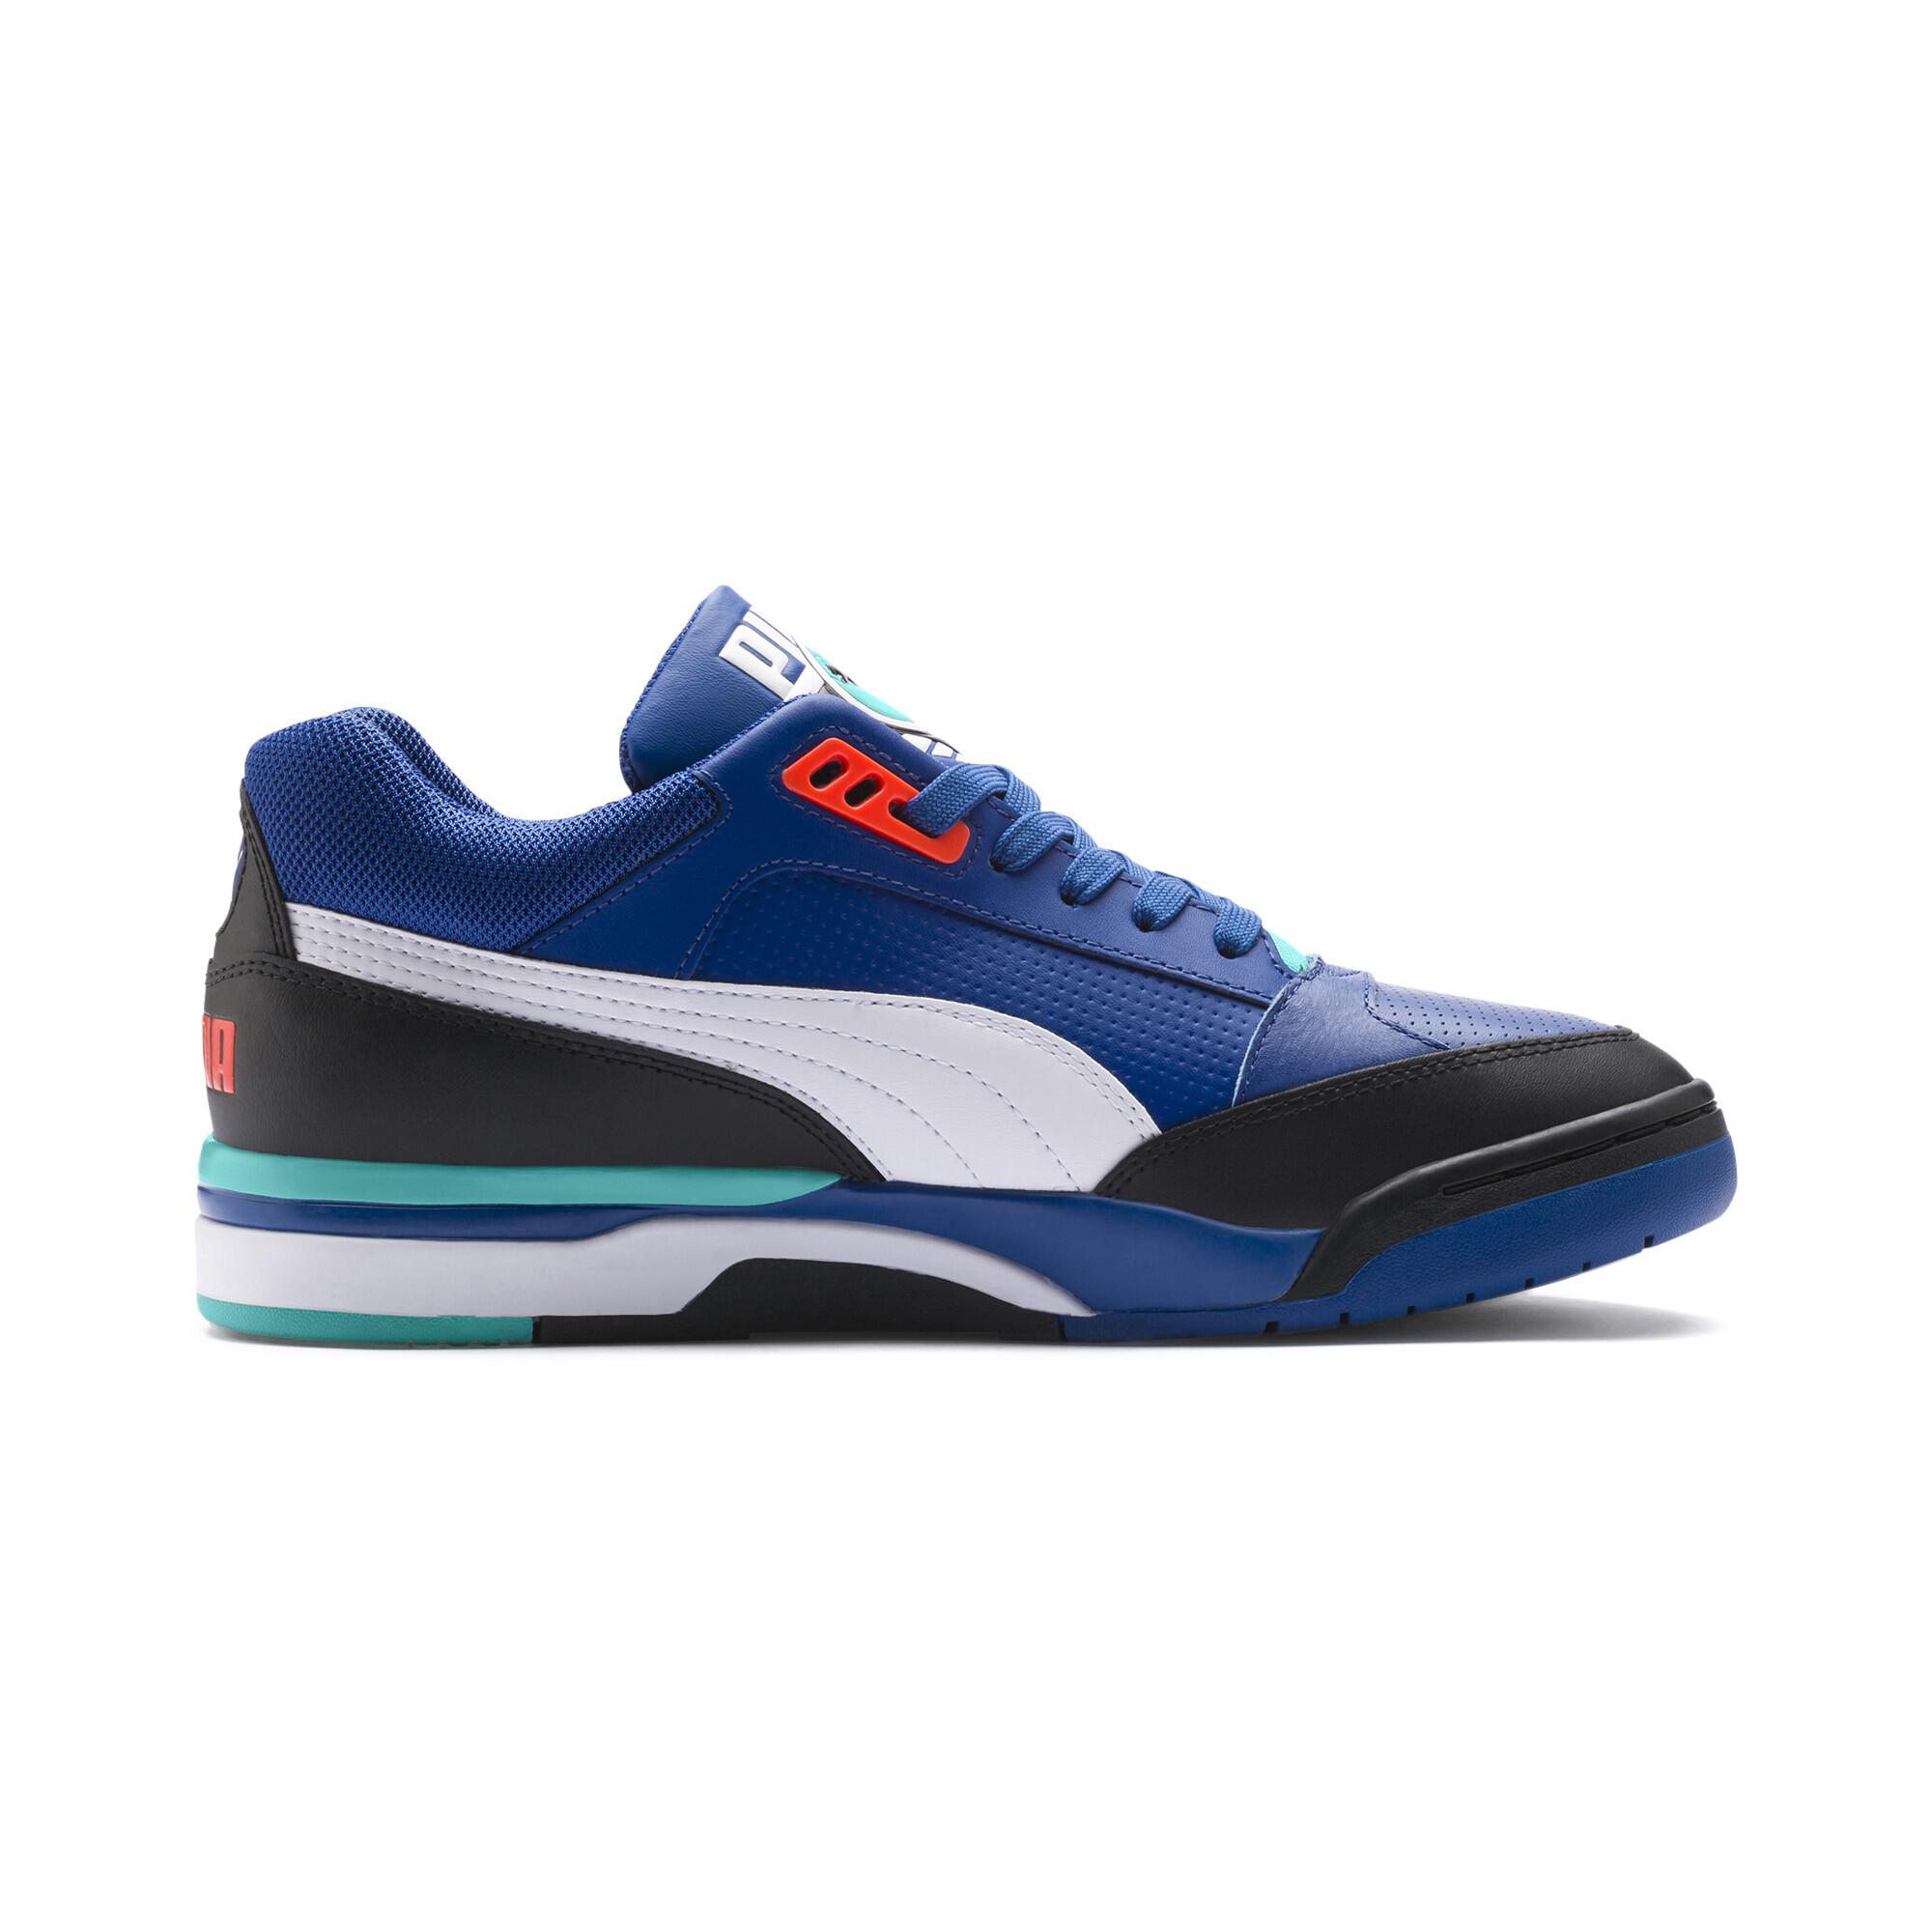 Indexbild 39 - PUMA Palace Guard Sneaker Unisex Schuhe Sport Classics Neu